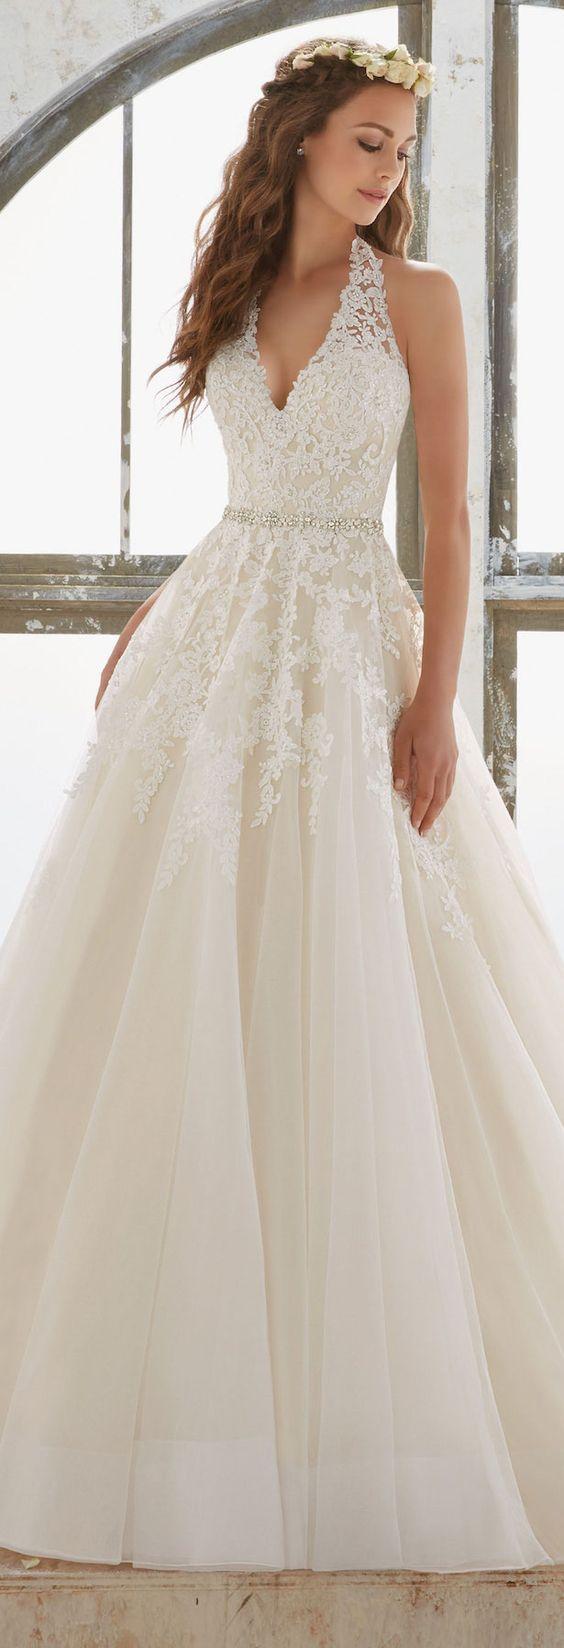 Mariage - Wedding Dress Inspiration - Mori Lee